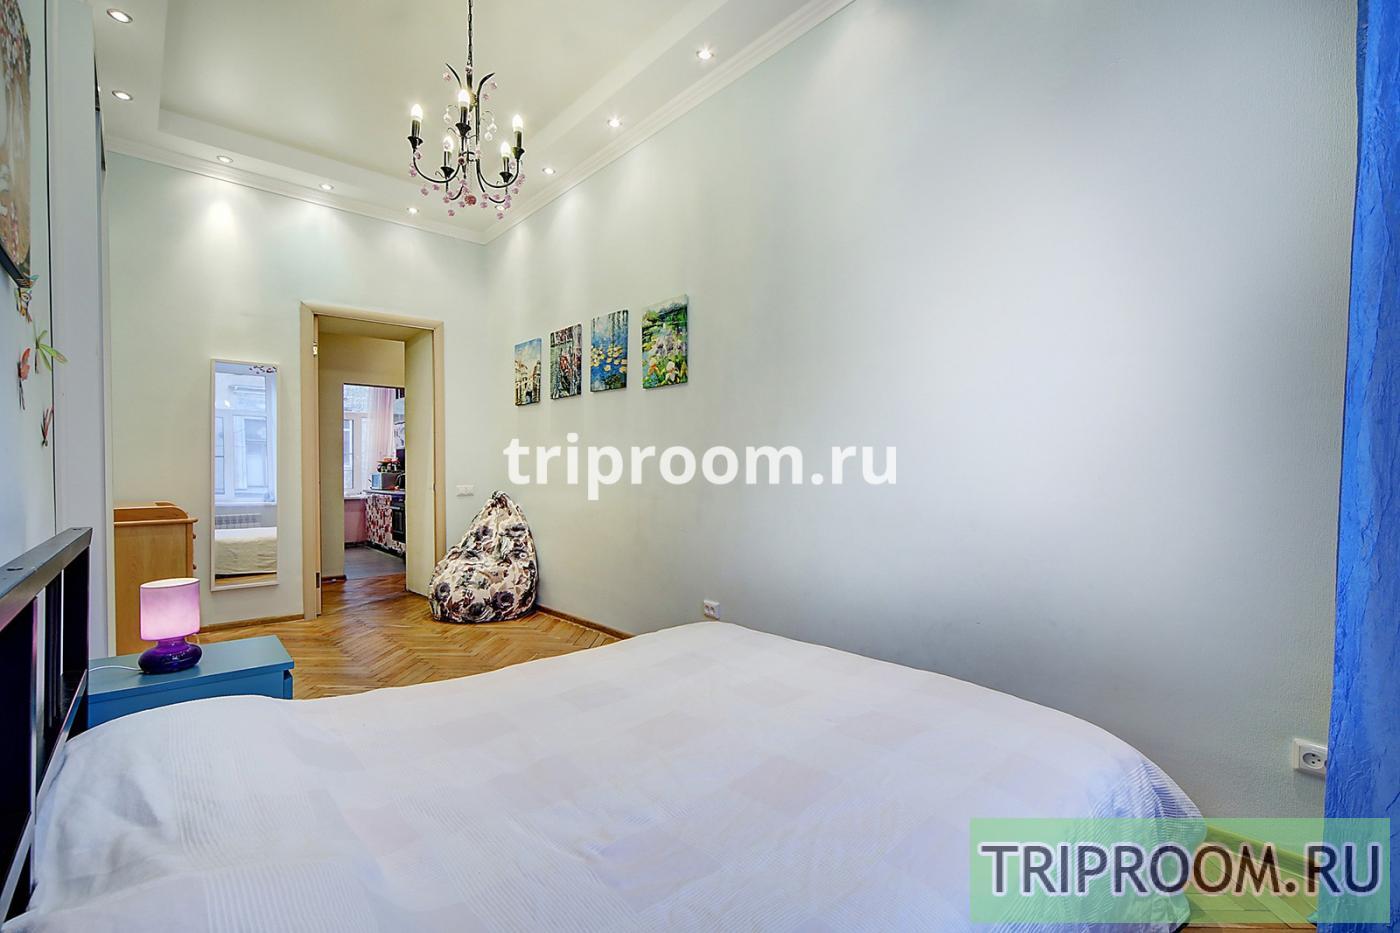 2-комнатная квартира посуточно (вариант № 15426), ул. Лиговский проспект, фото № 17